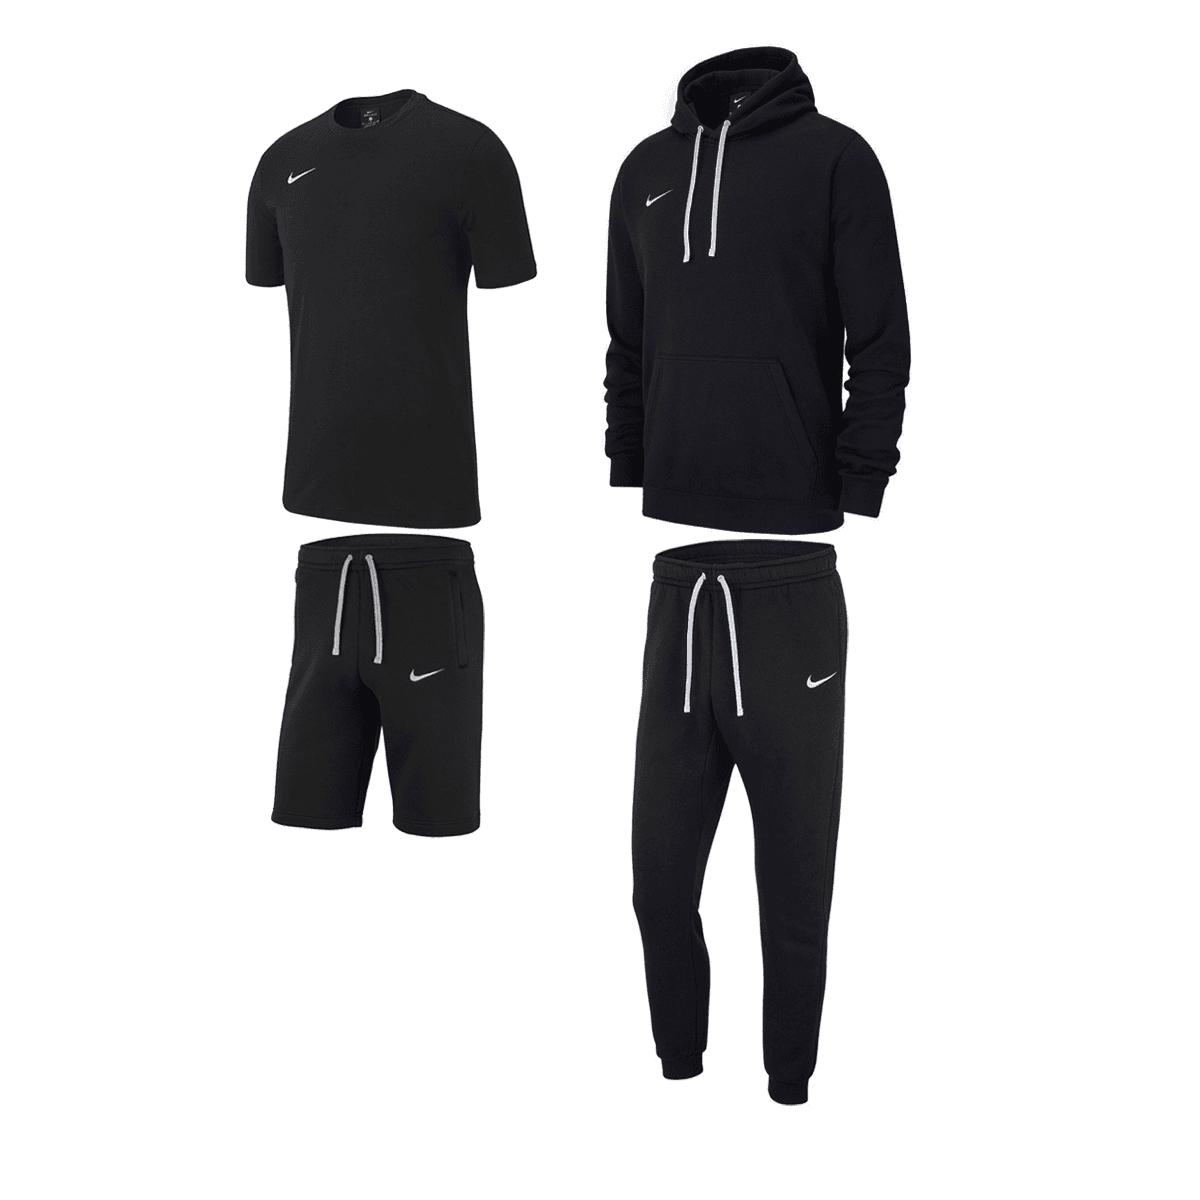 Nike Team Club 19 4-delige set @ Geomix